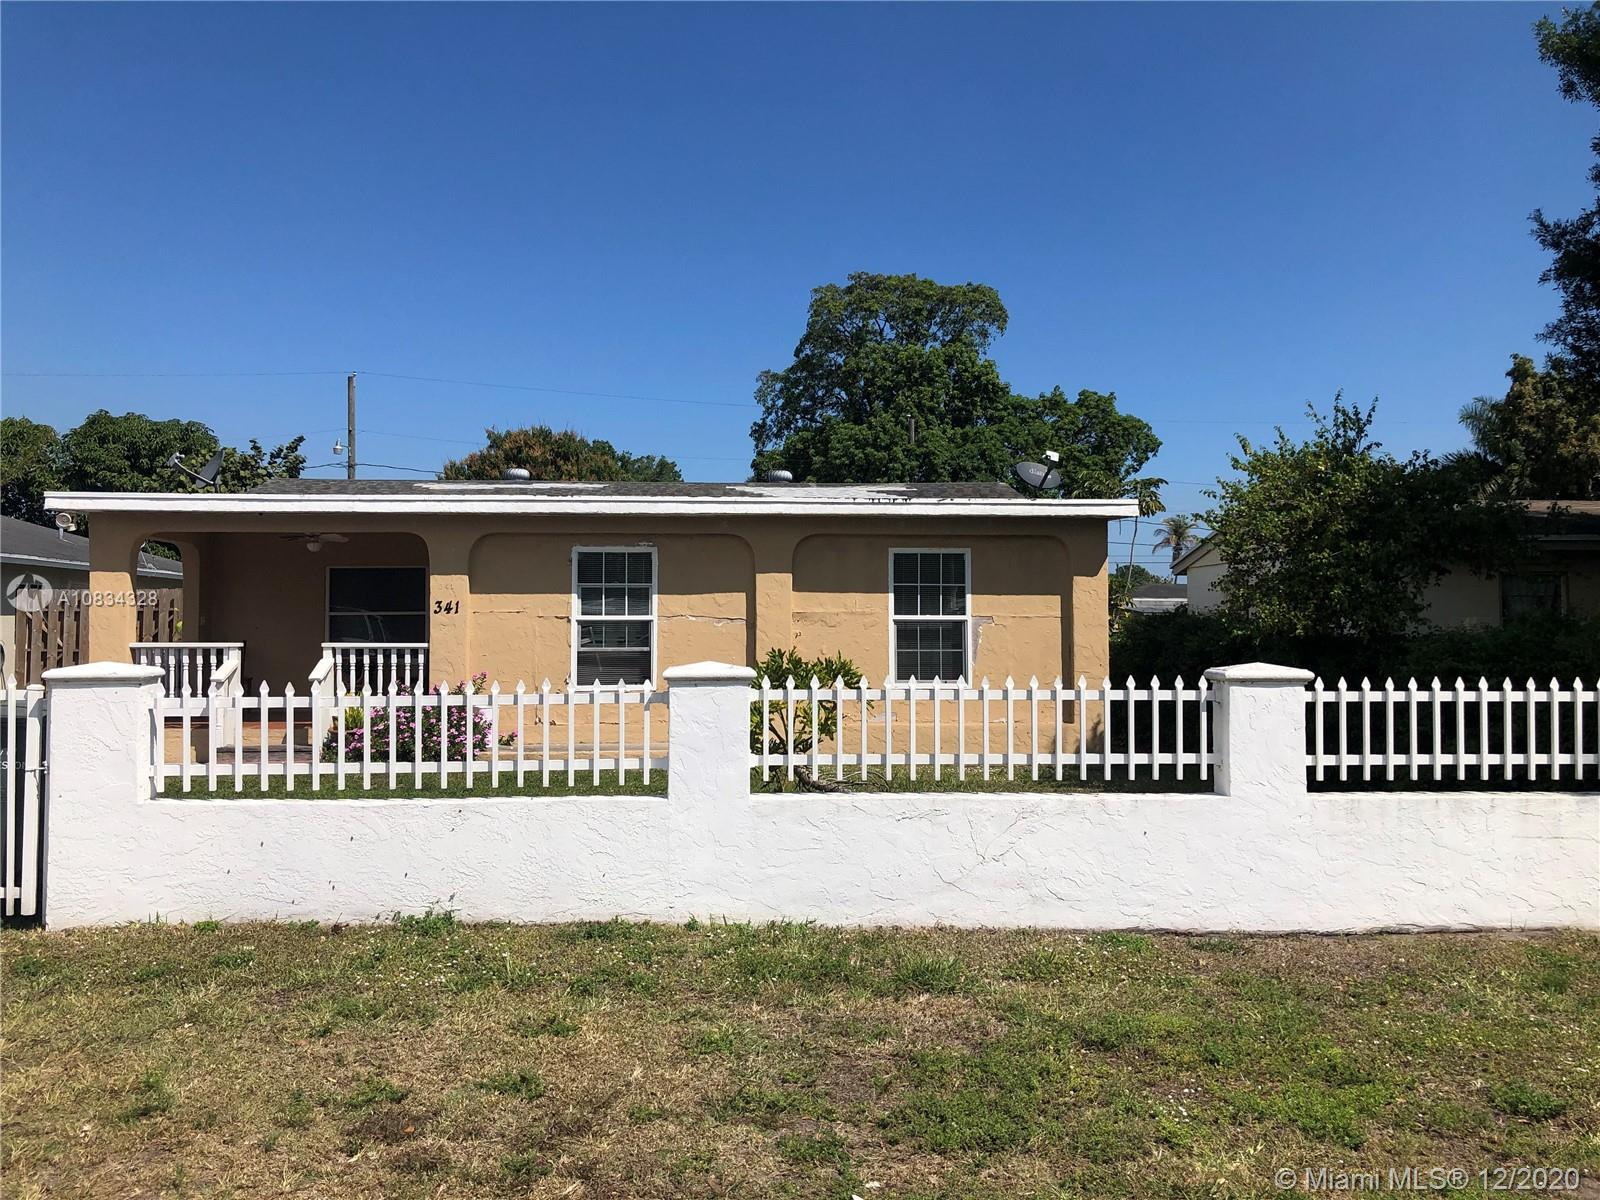 341 W HAITI, Clewiston, FL 33440